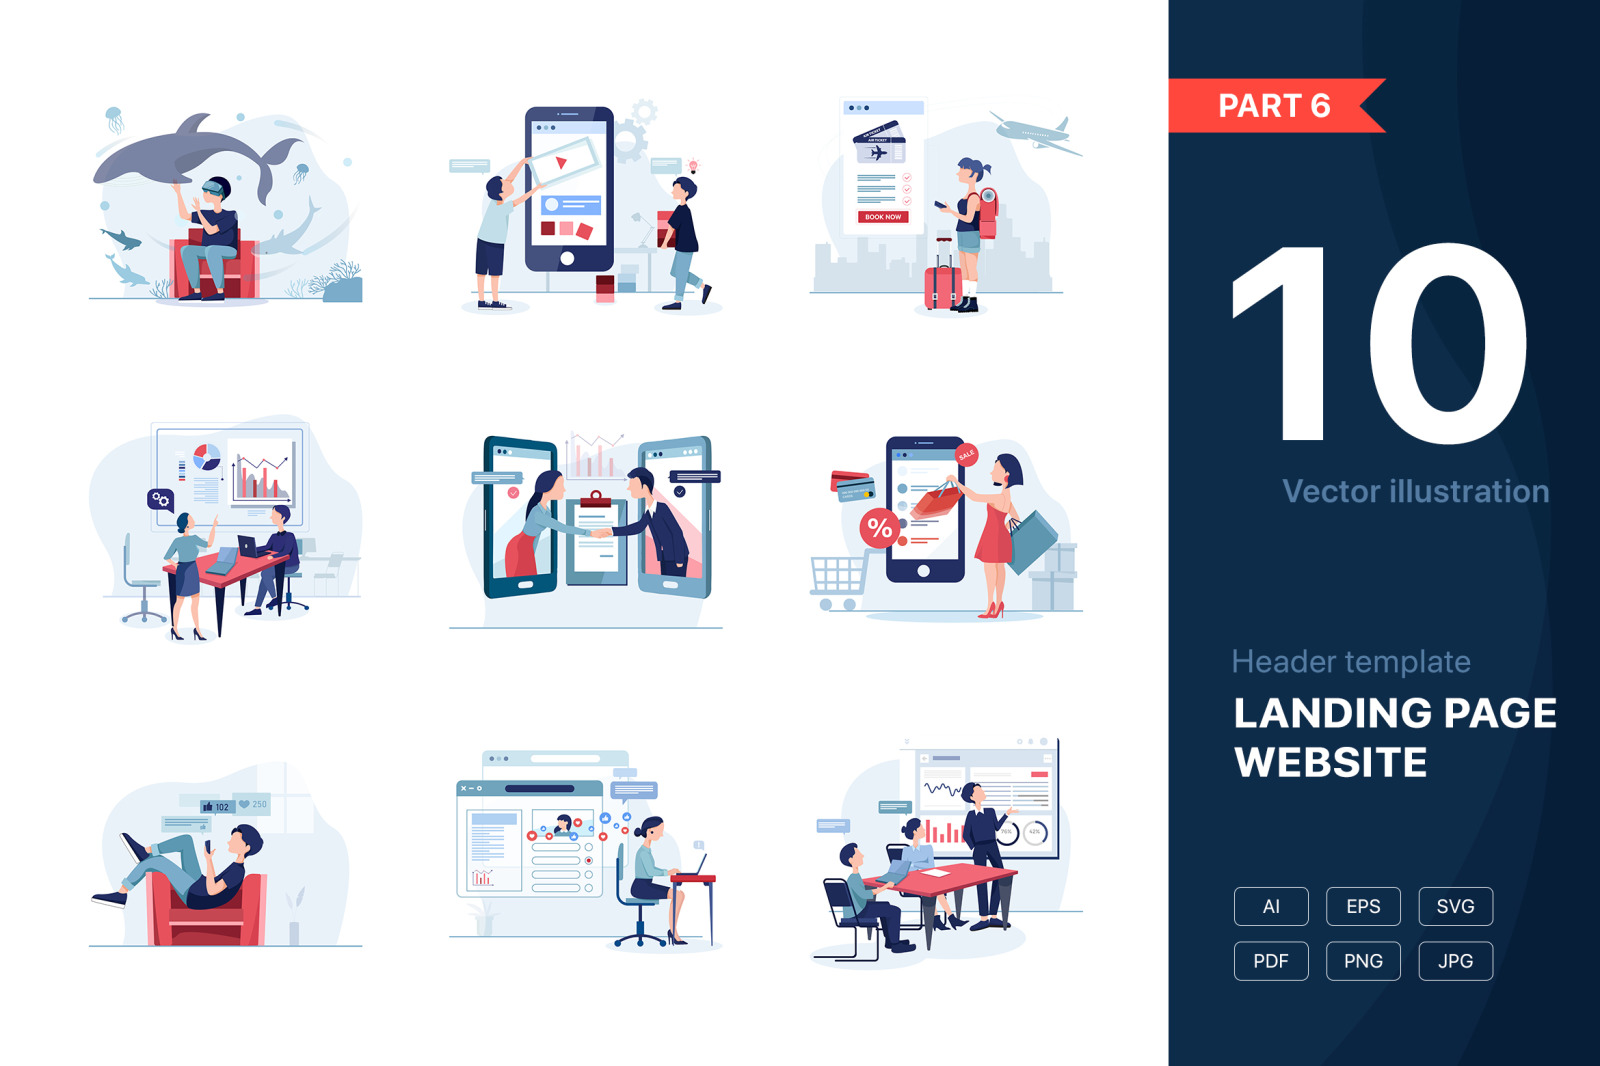 [Part 6] Website Illustrations Set